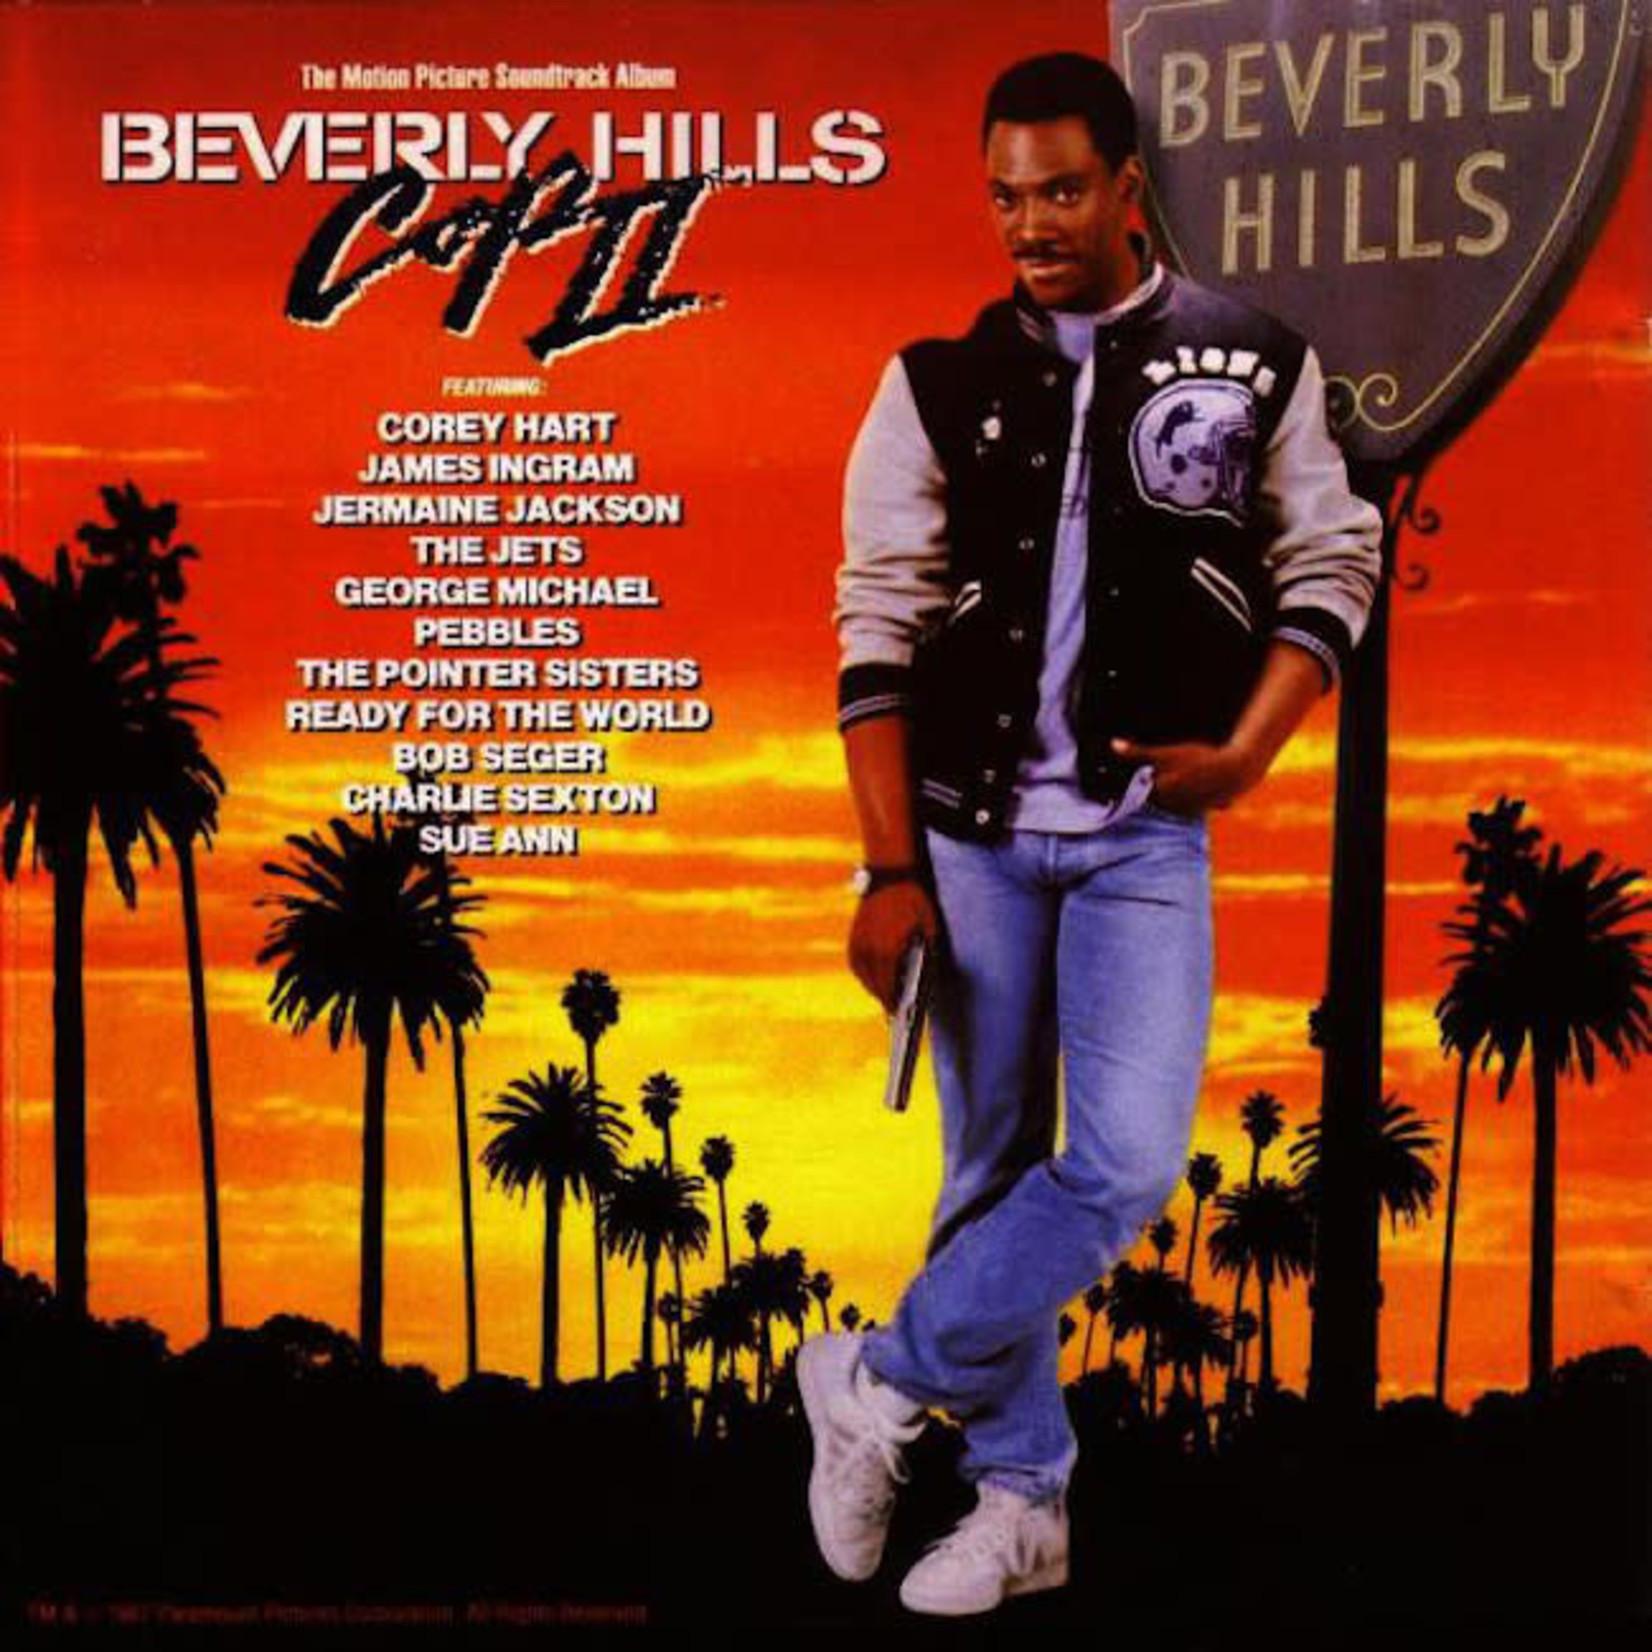 [Vintage] Various: Beverly Hills Cop II (Soundtrack)